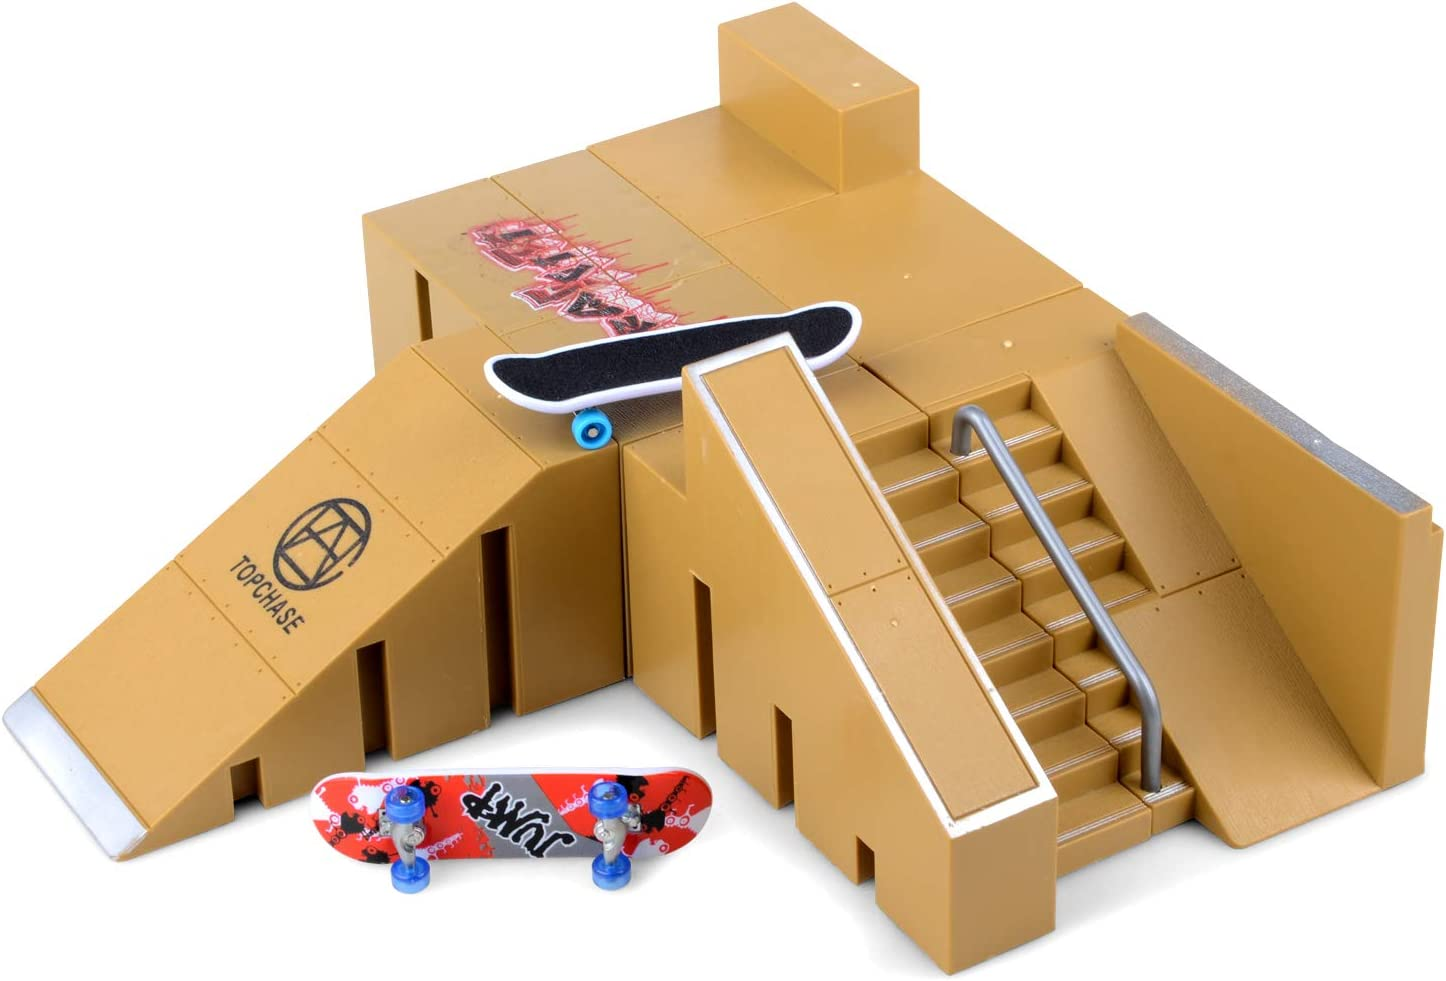 Skate Park Kit, Hometall 5PCS Skate Park Kit Ramp Parts for Finger Skateboard Ultimate Parks Training Props (5PCS)